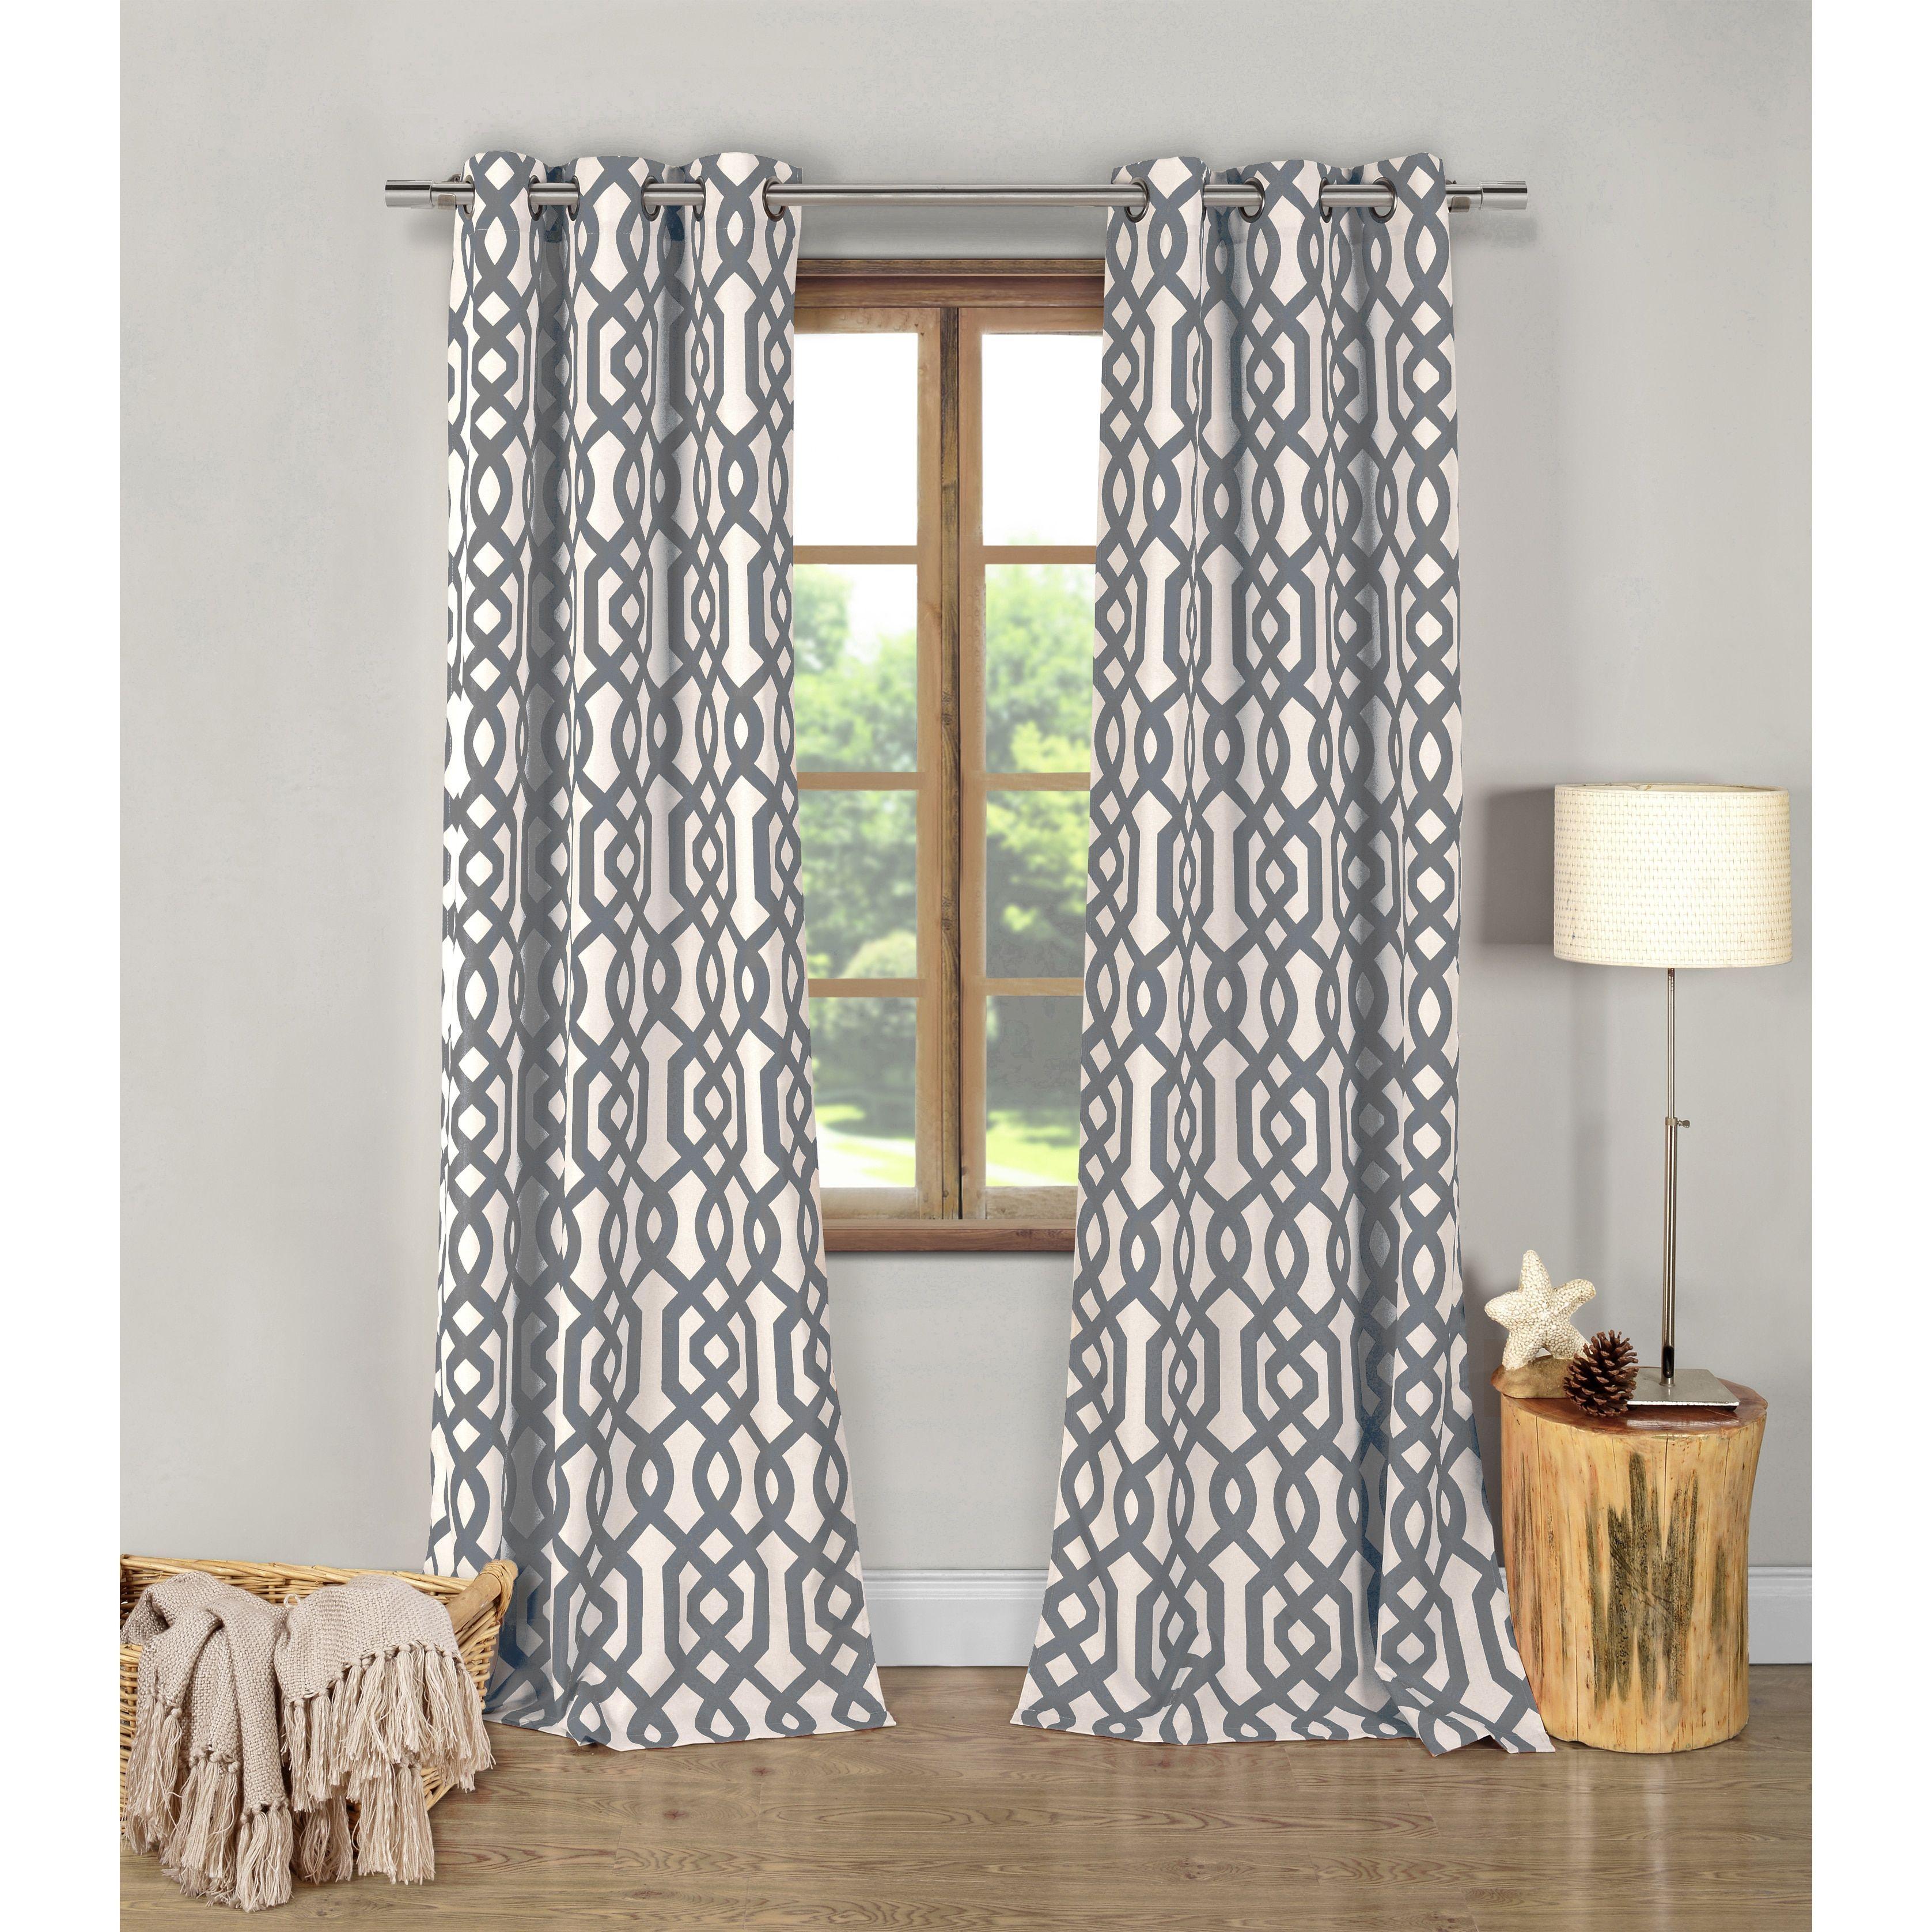 Duck river ashmont geometric inch grommet top curtain panel pair